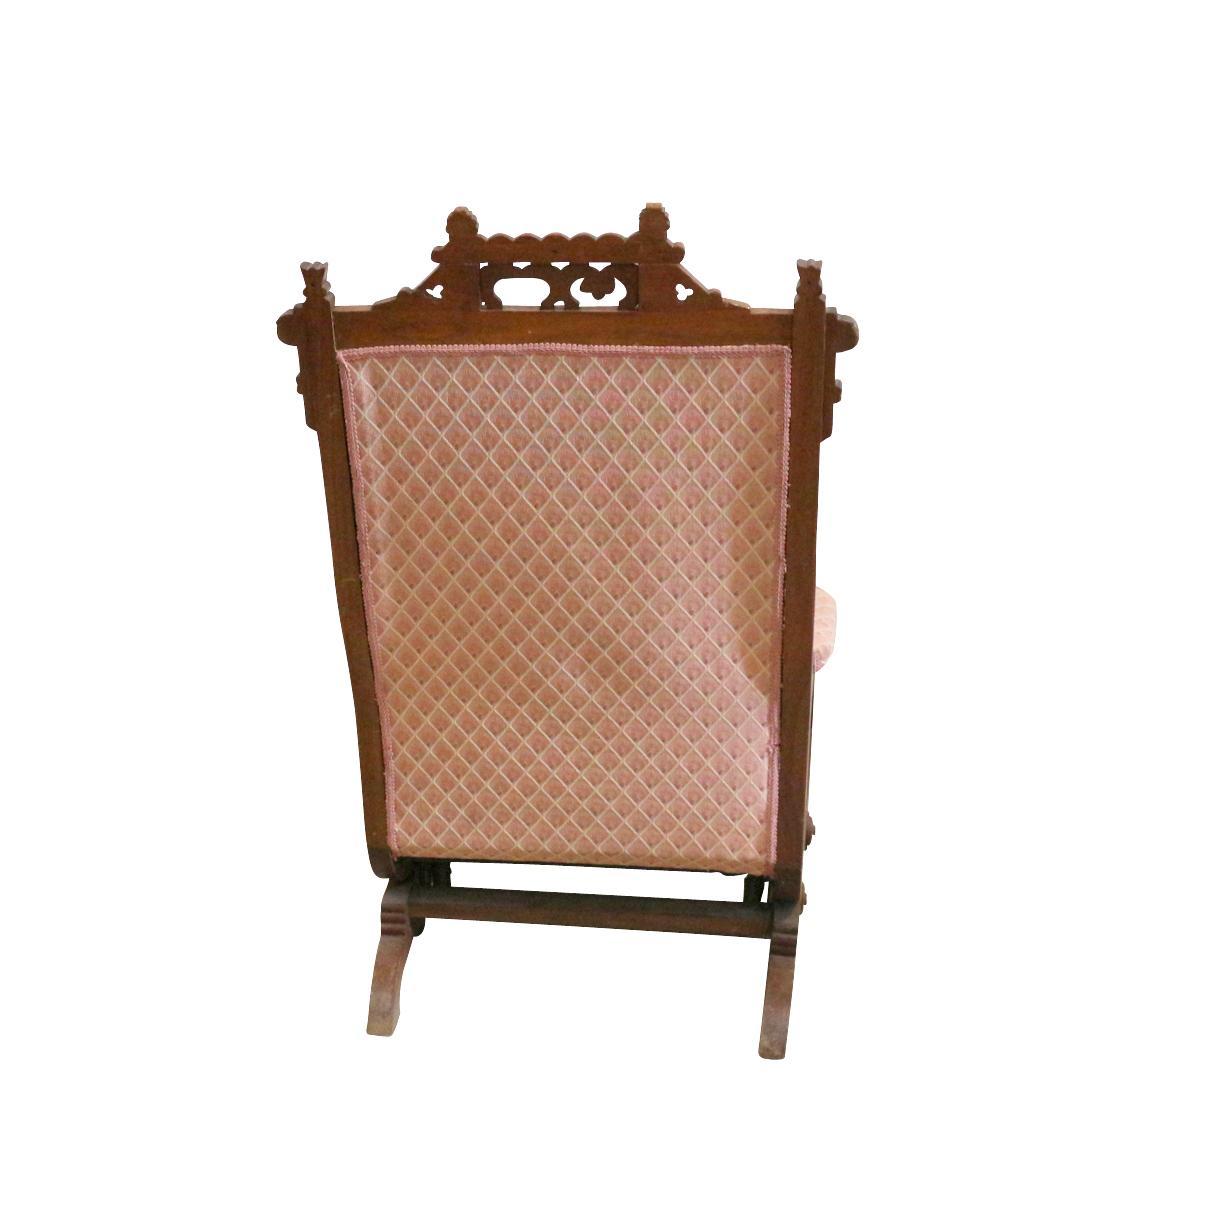 1880s Pink Rocking Chair  Chairish